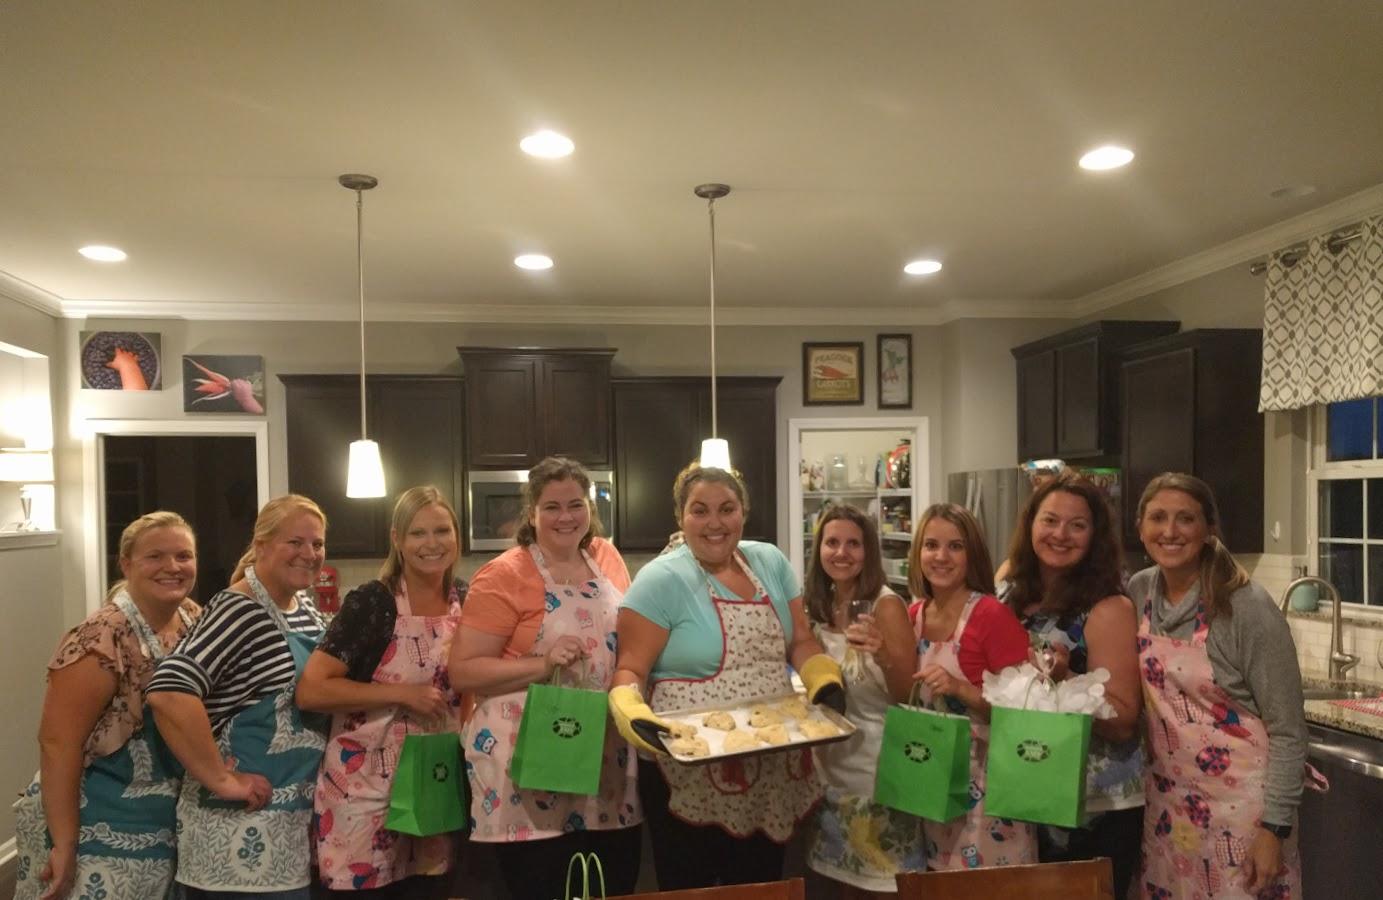 Bake and Sip | thegreengiraffeeats.com